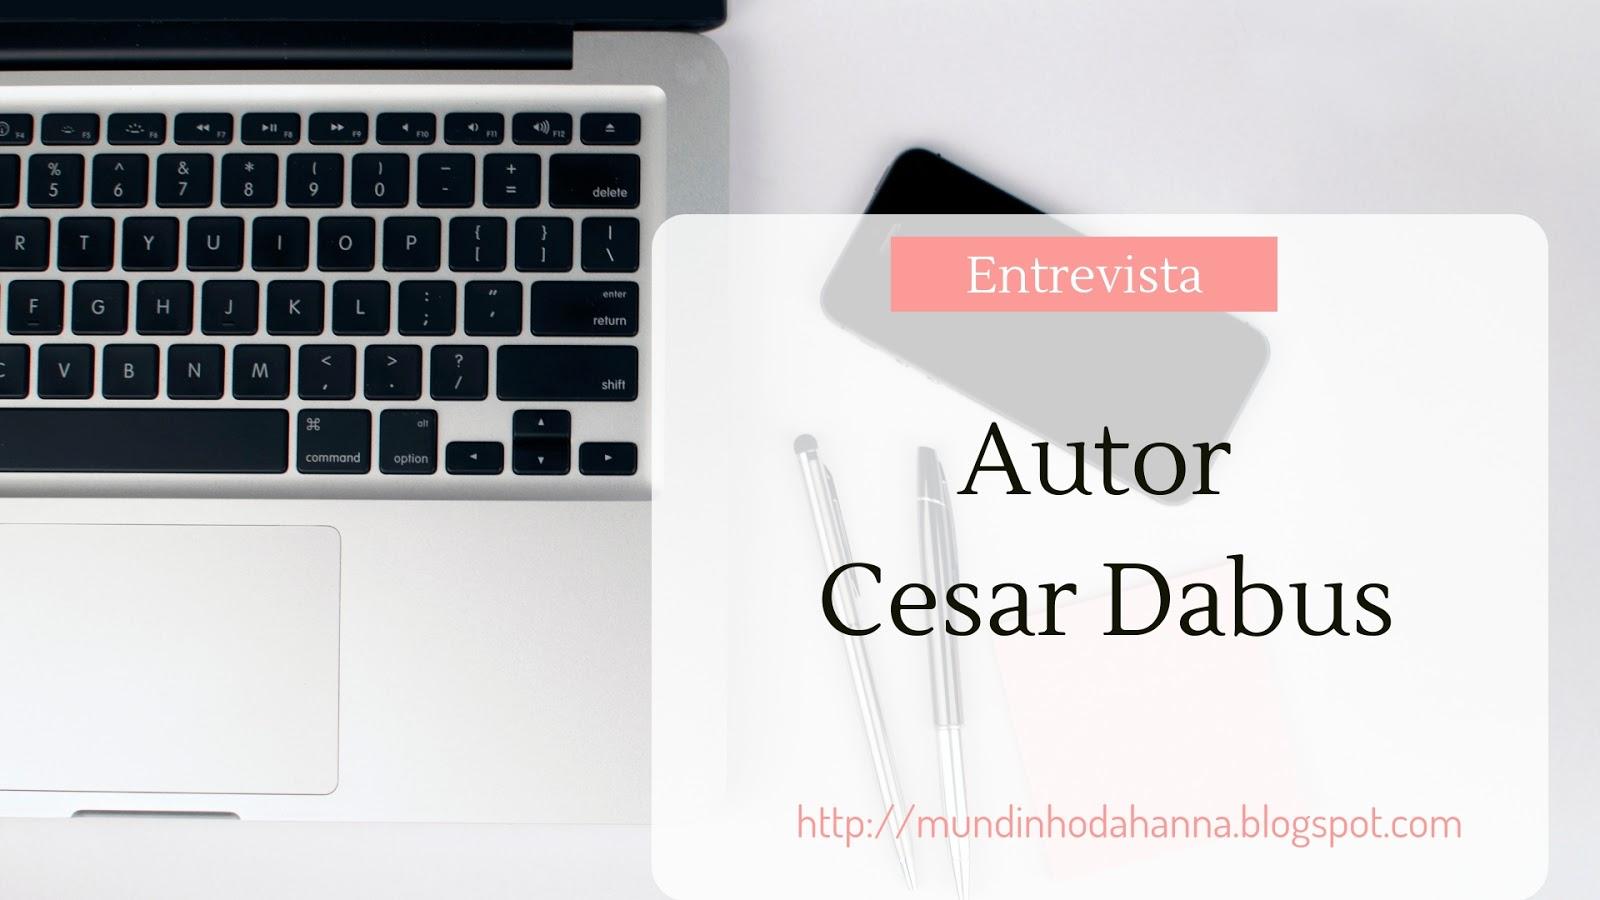 Entrevista com César Dabus